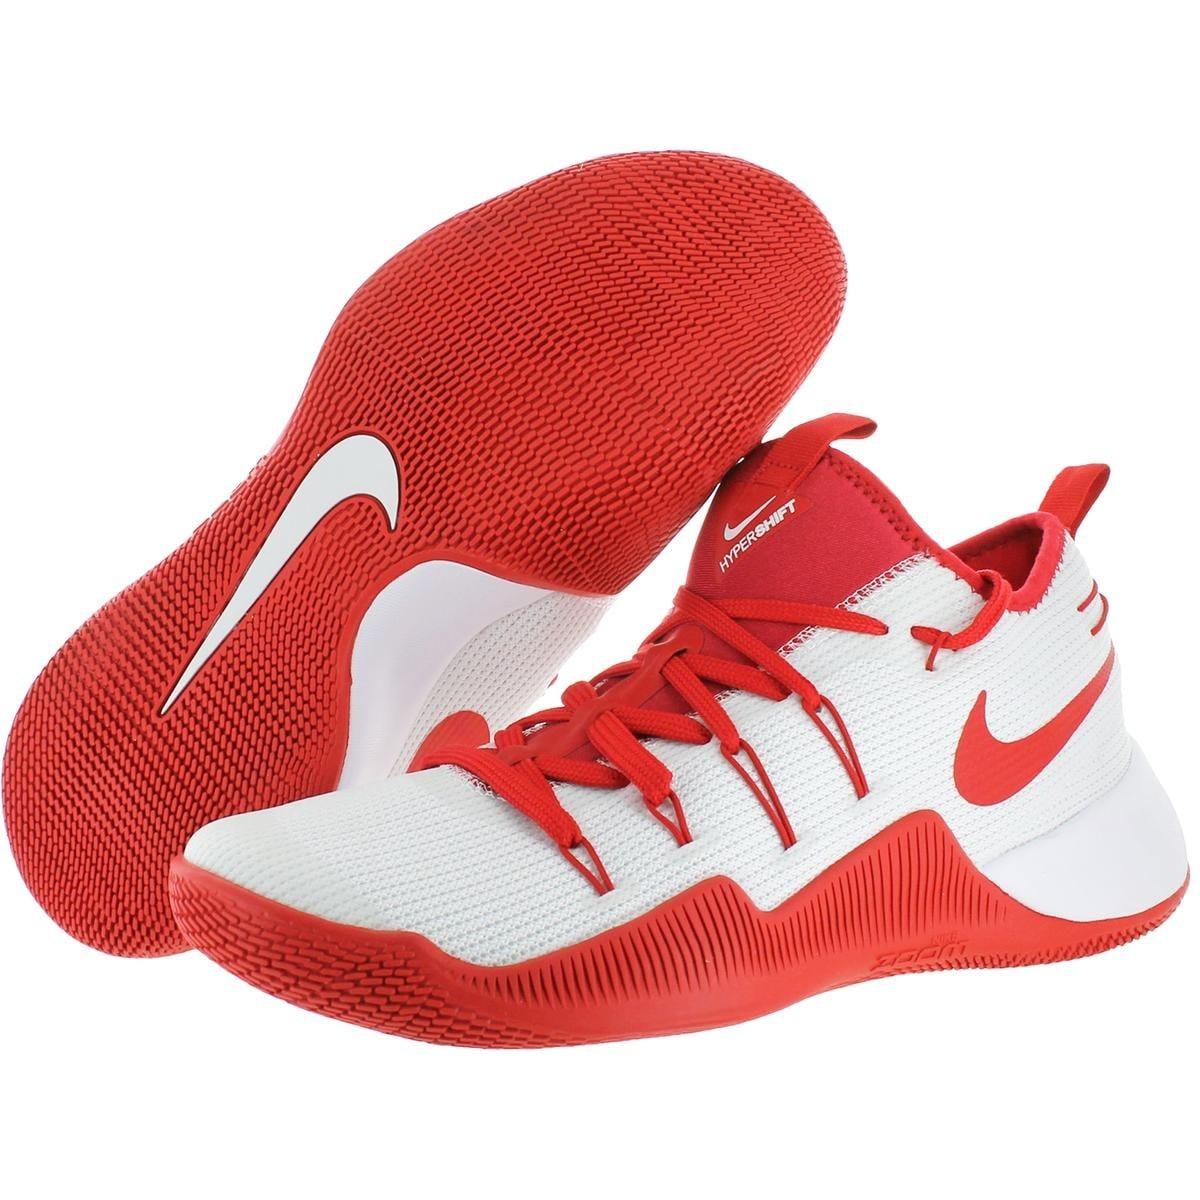 c74f5da9a1e0 ... buy shop nike mens hypershift tb promo basketball shoes mid top nike  zoom ships to canada